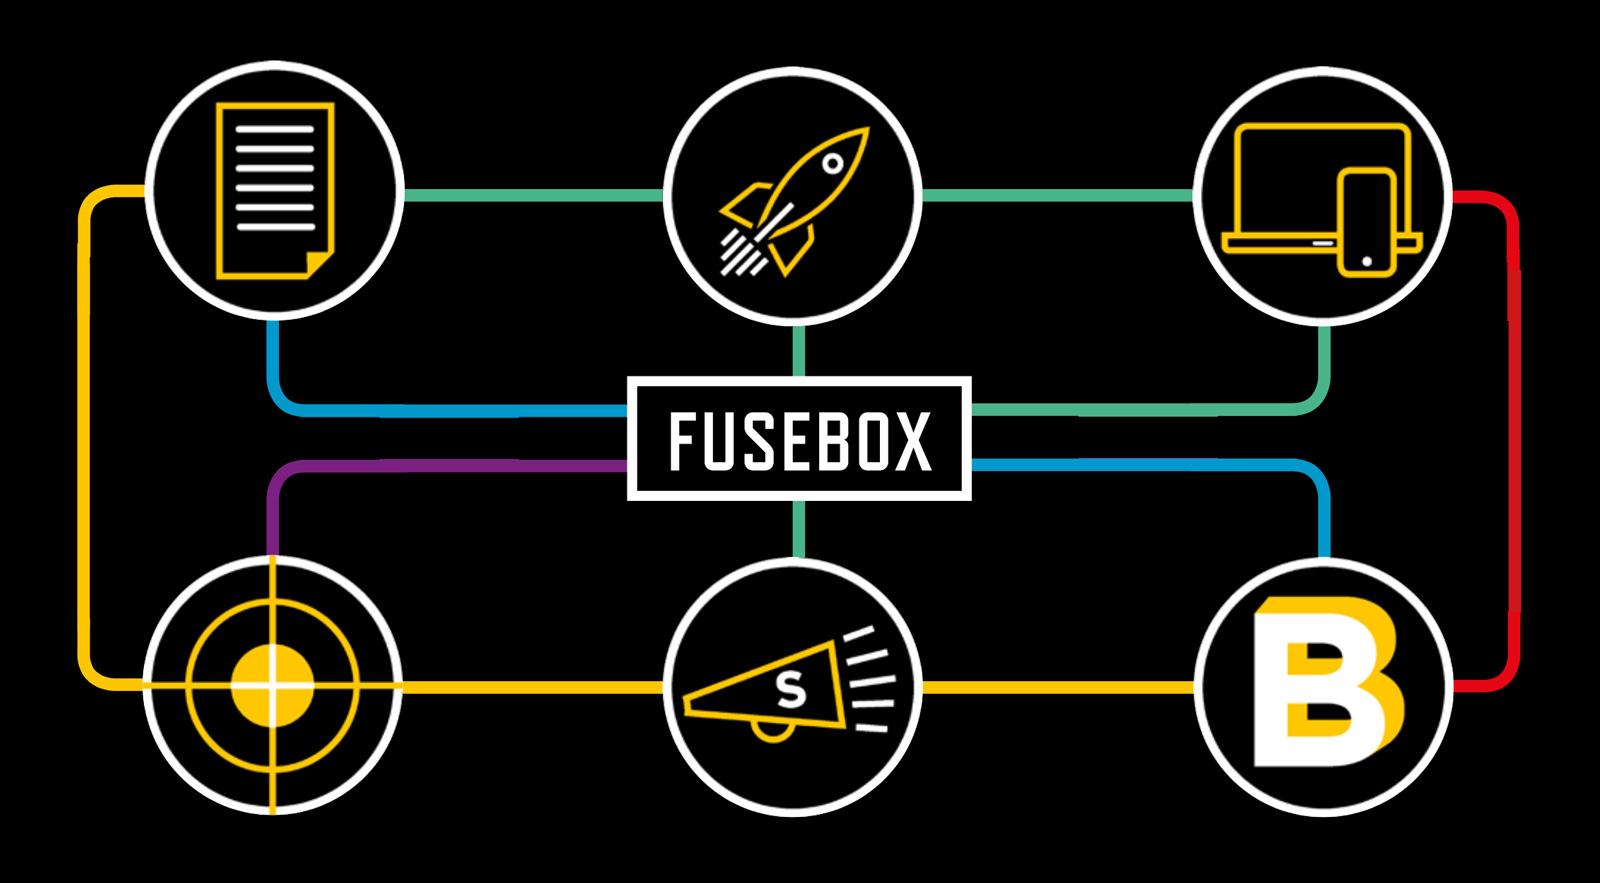 Fusebox focus areas - all